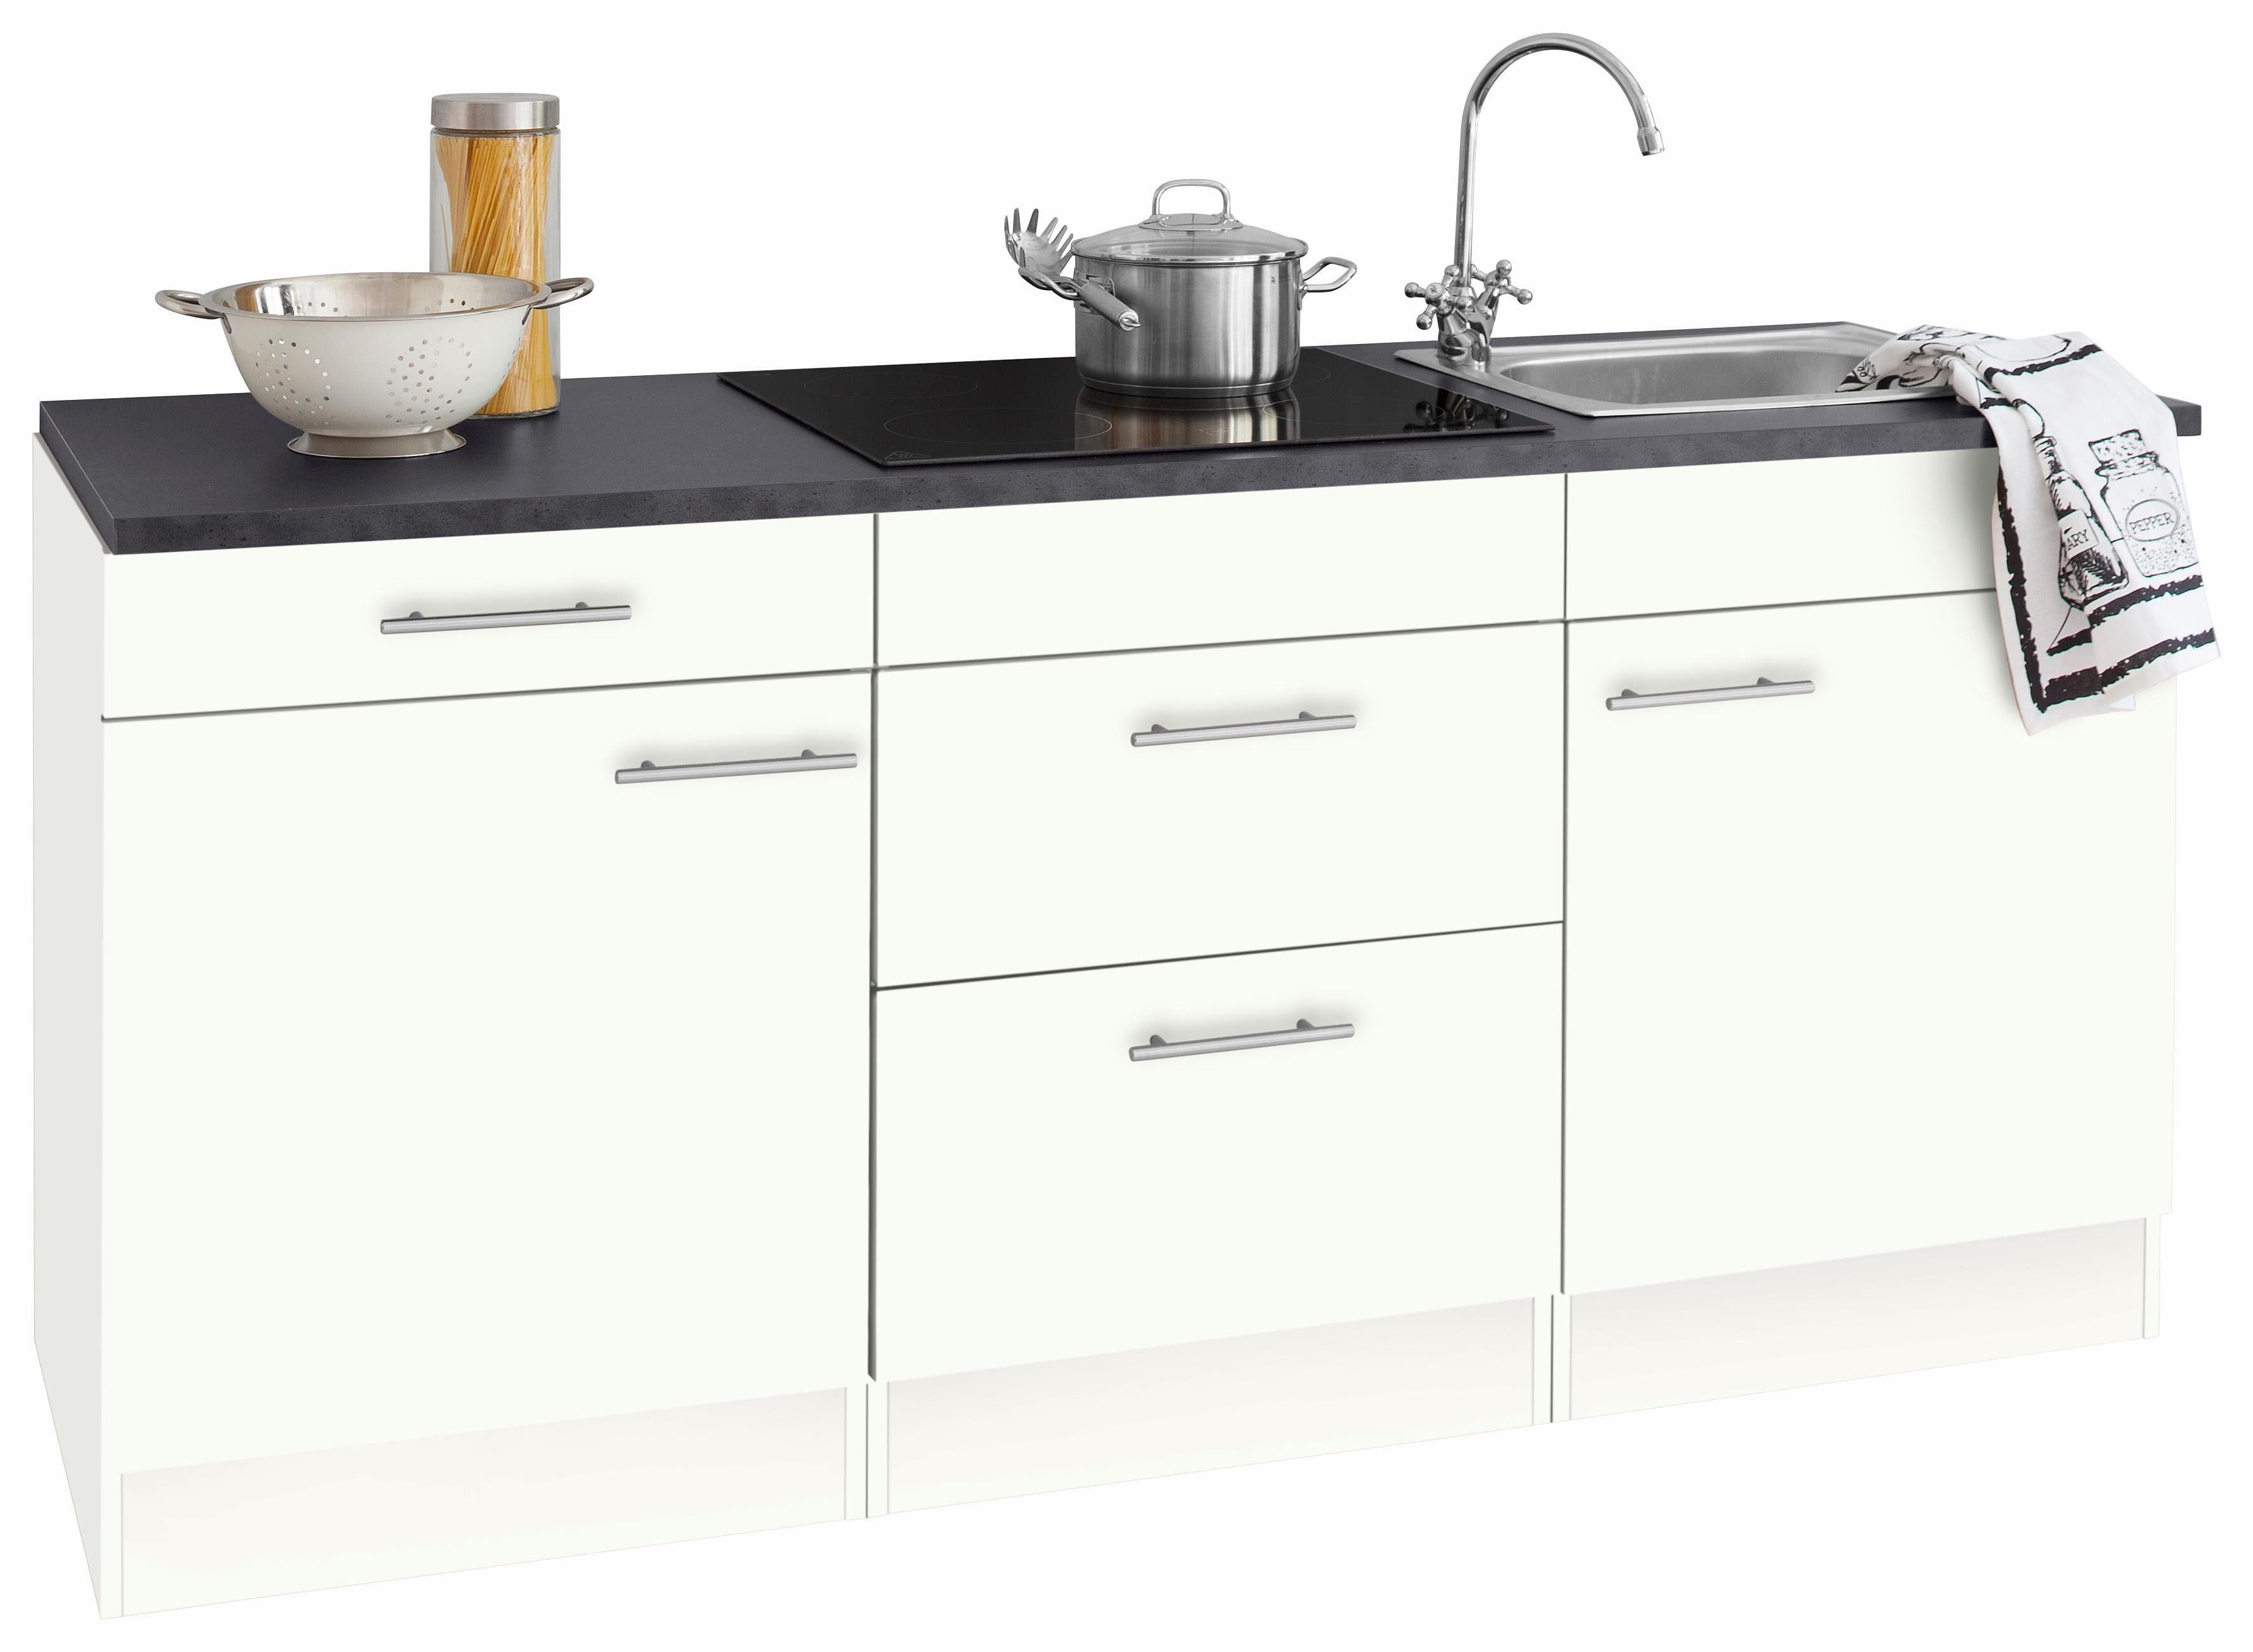 Mini Kühlschrank Otto : Singleküche miniküchen online kaufen otto